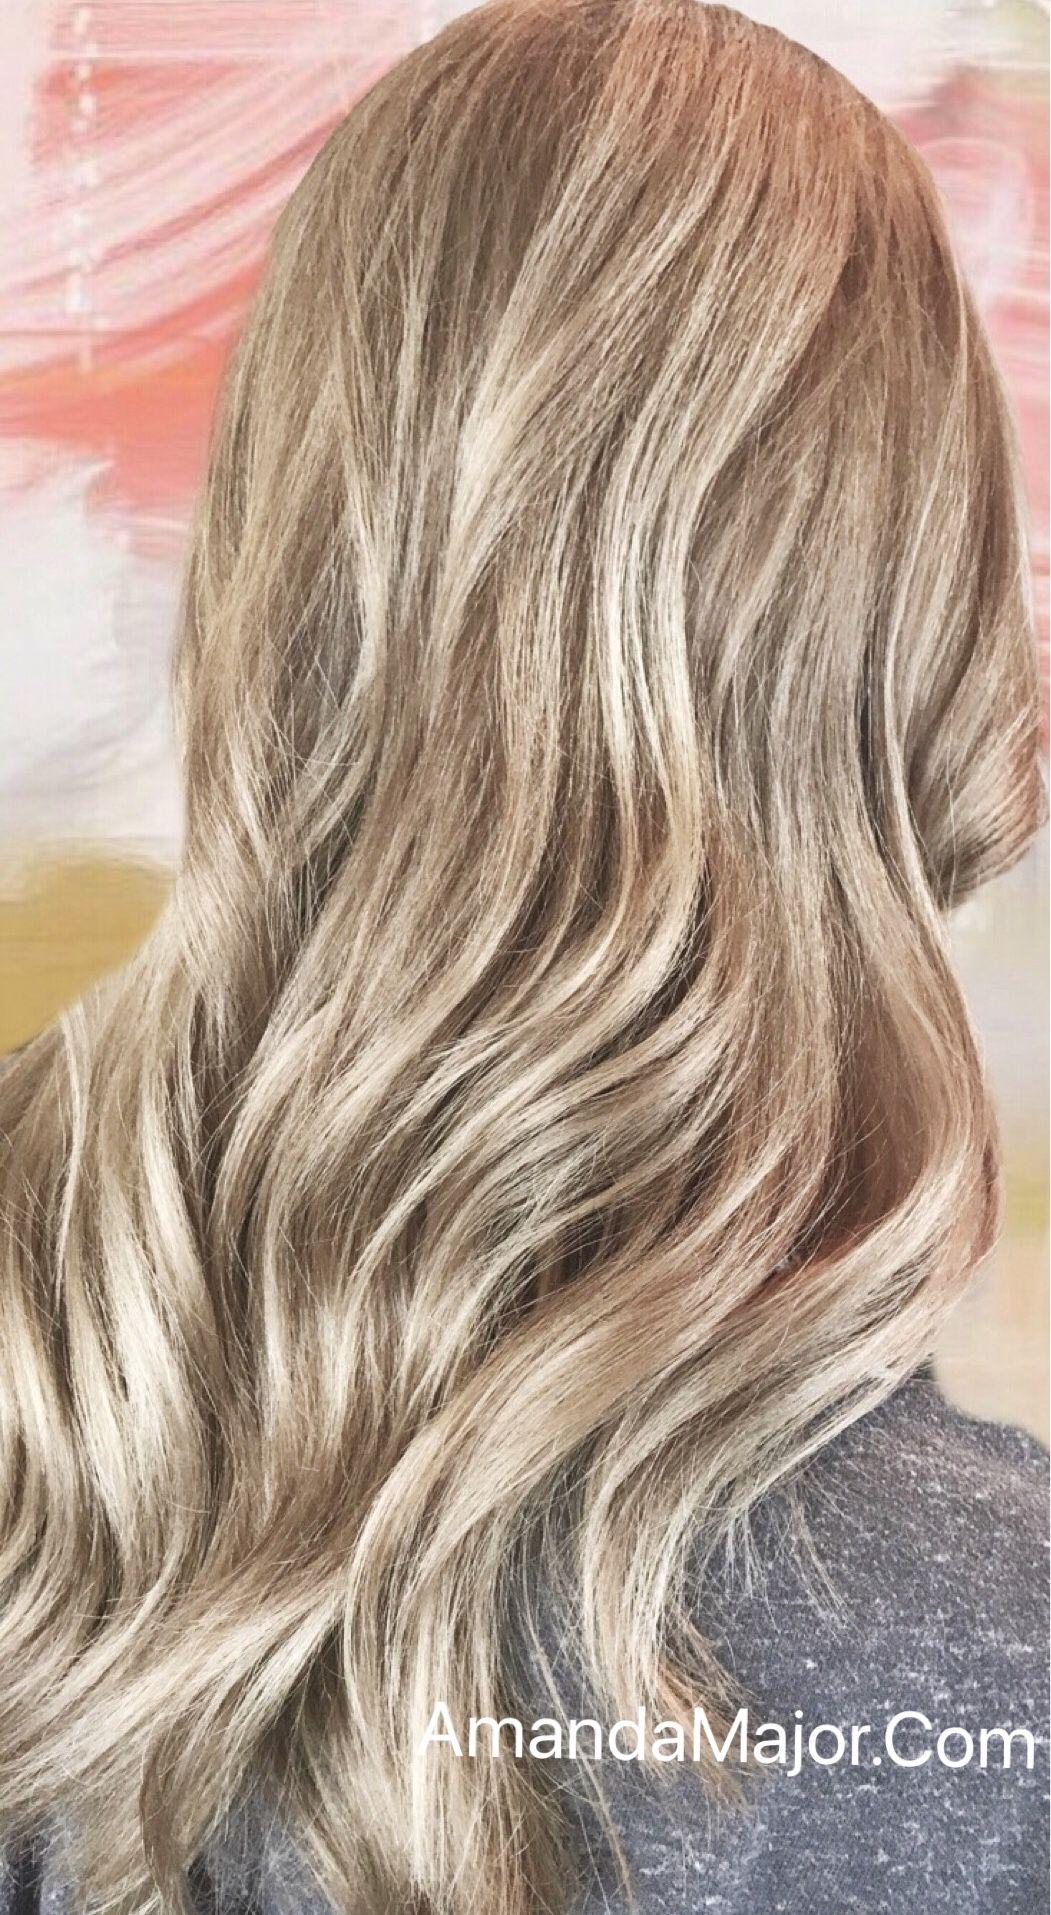 Best Balayage Hair Amandamajor Boca Raton Delray Beach